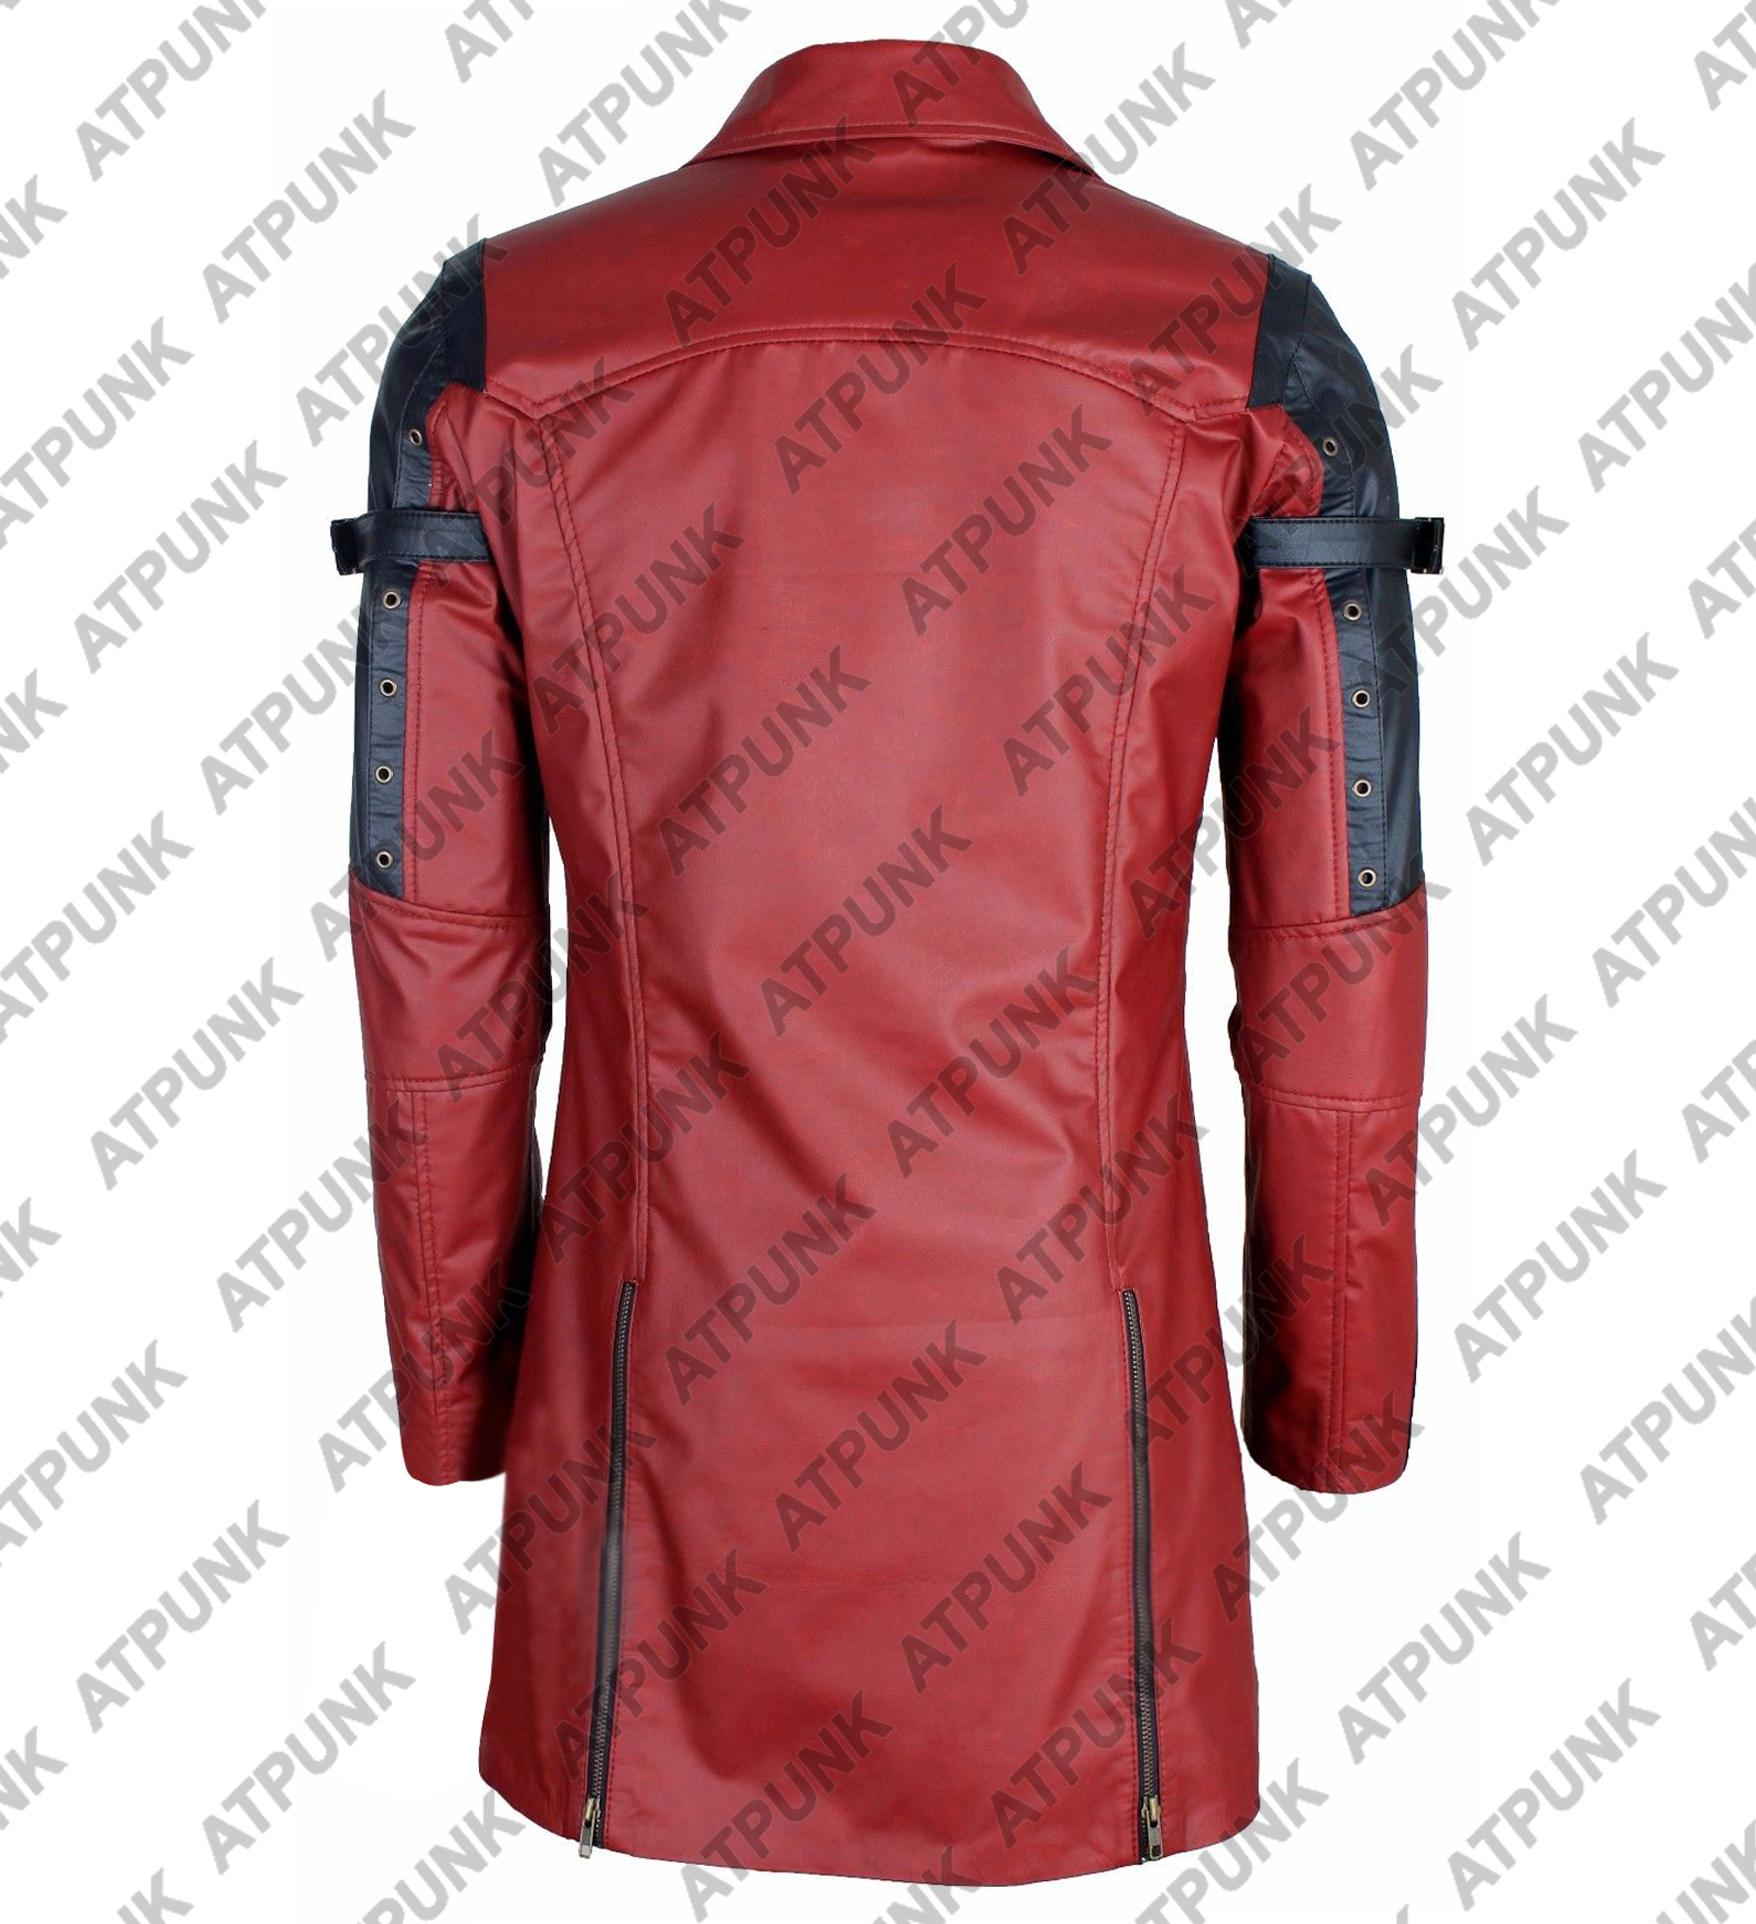 rebelsmarket_men_goth_steampunk_military_jacket_red_black_faux_leather_poison_jacket_jackets_3.jpg